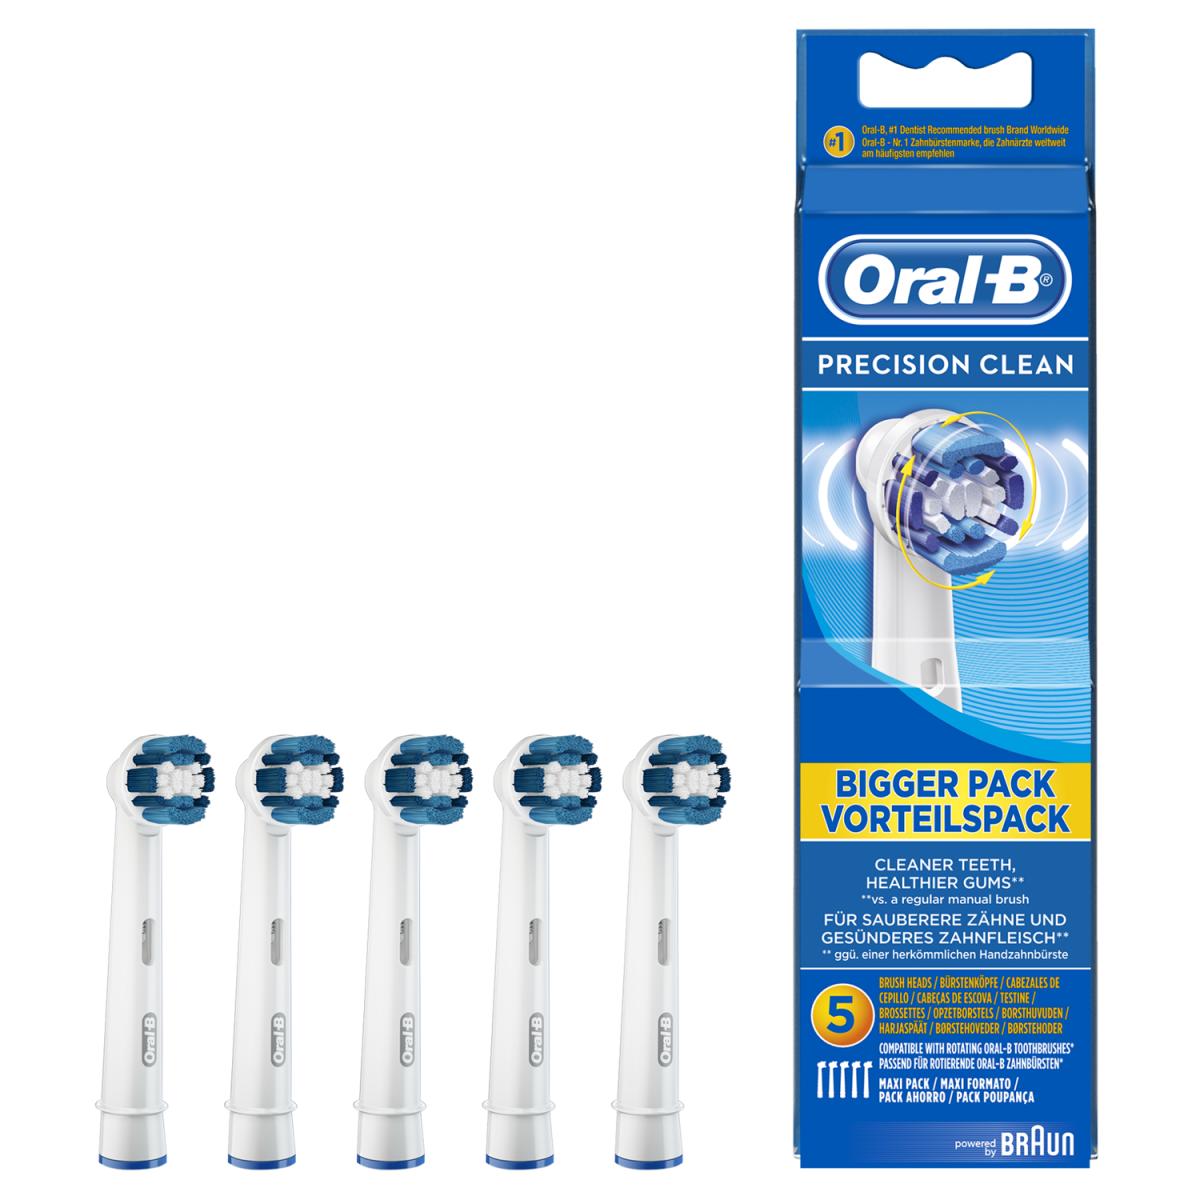 ORAL-B Børstehoveder precision clean 5 stk